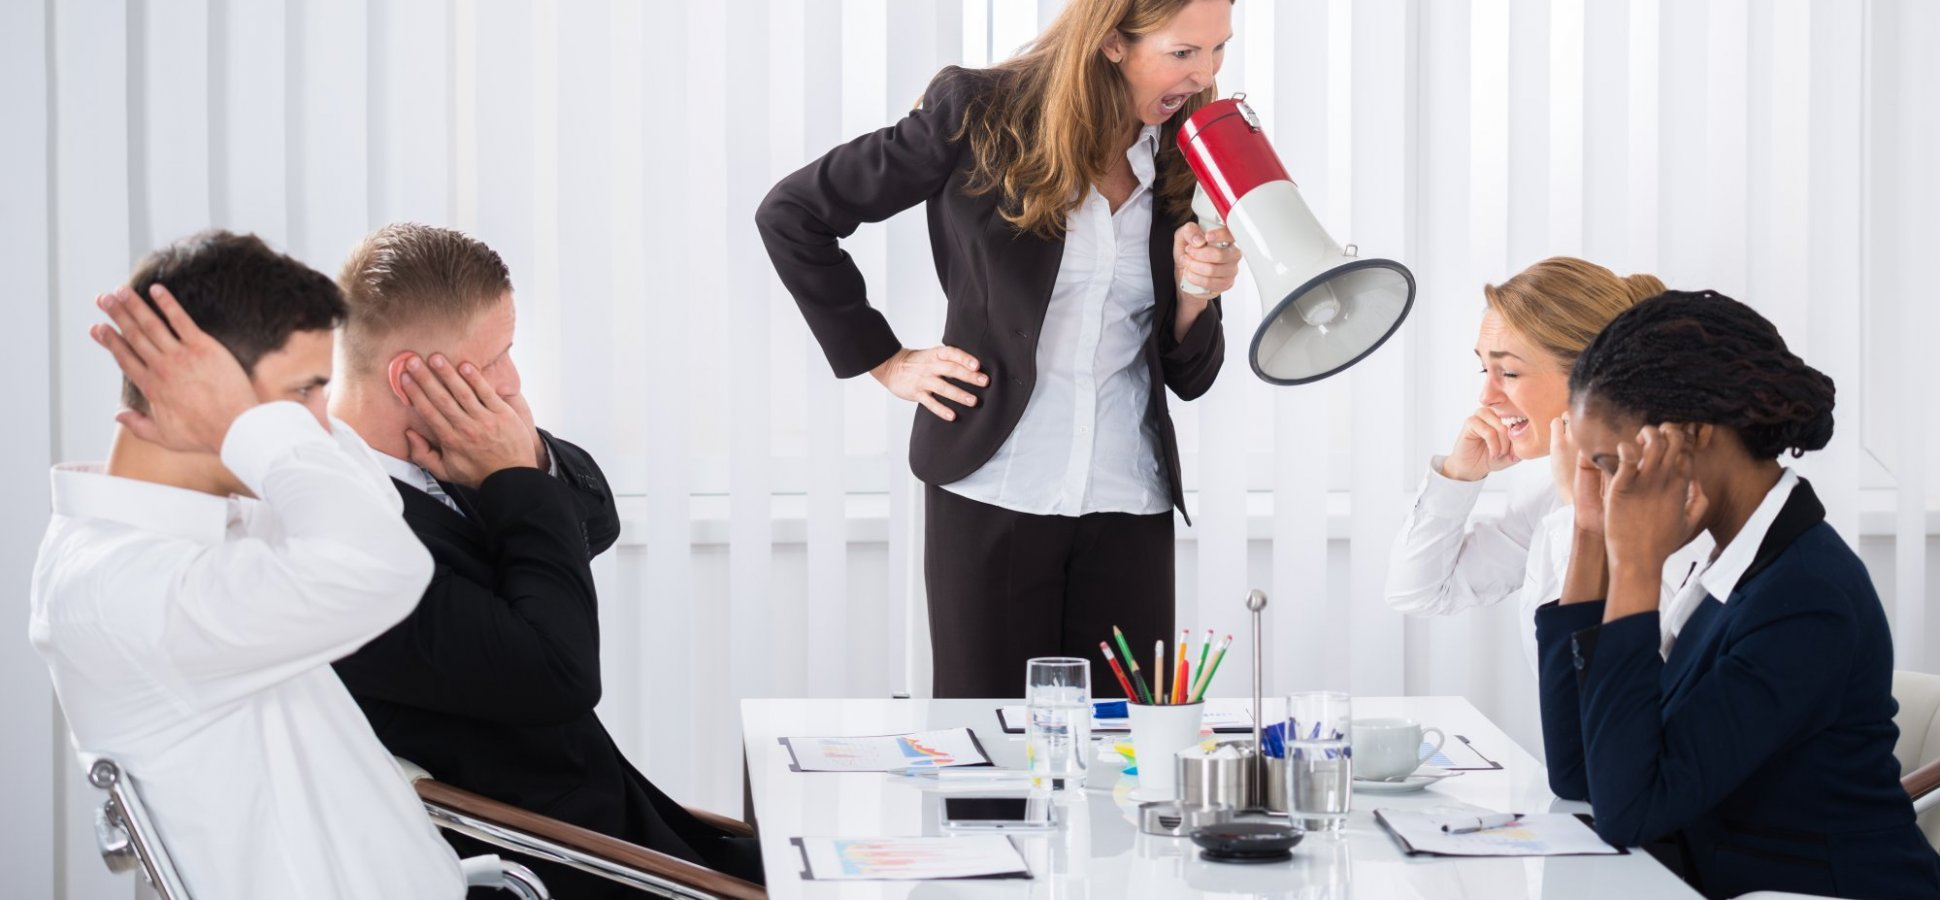 The Secret to Productive Meetings? Gratitude